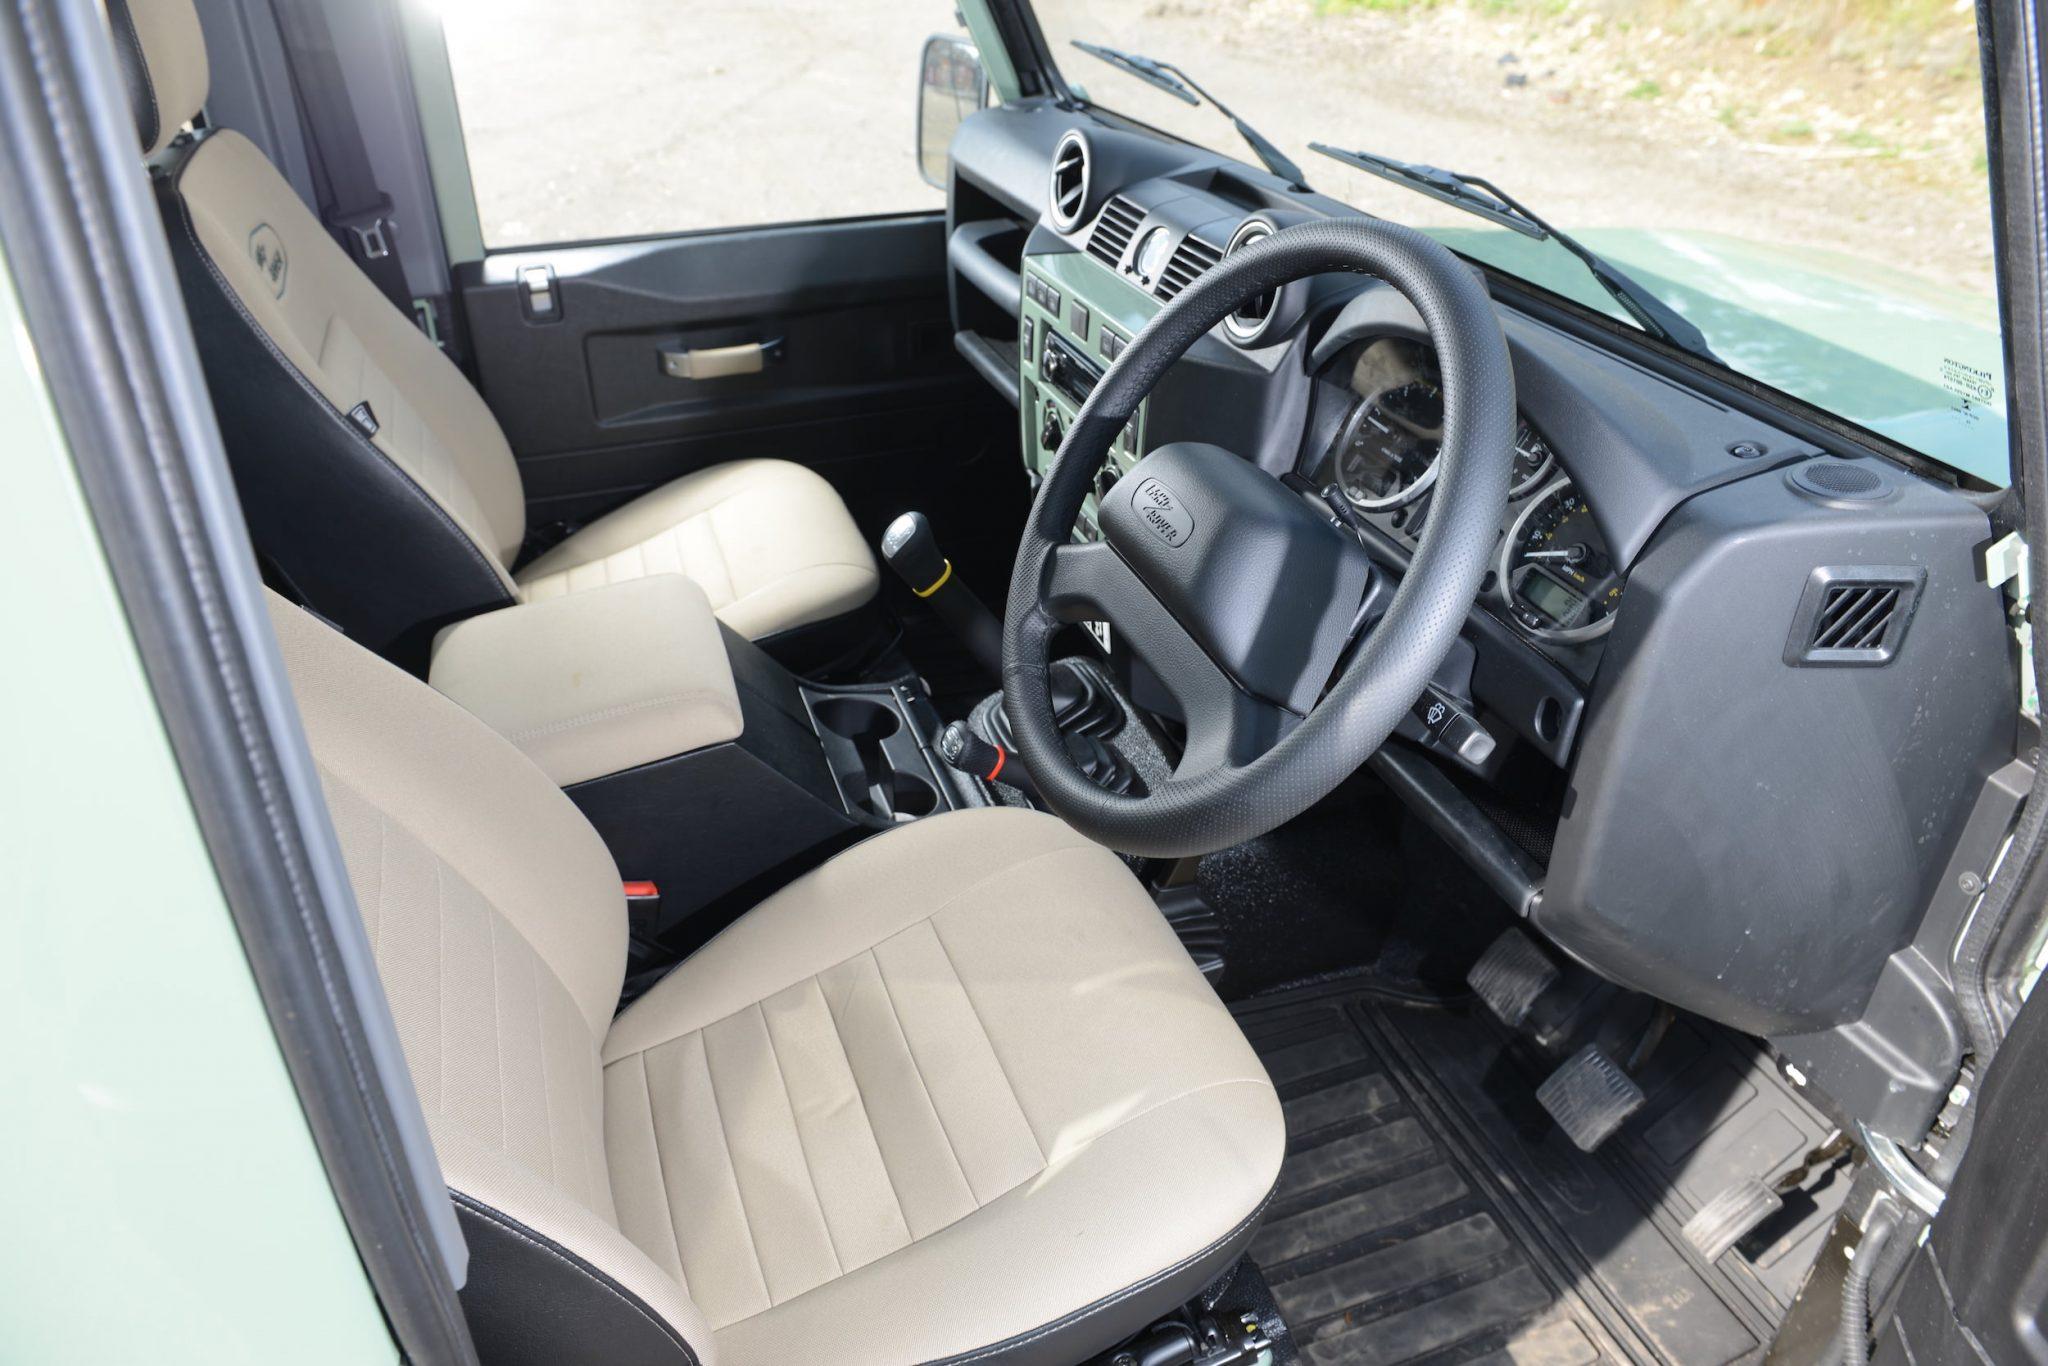 Rowan Atkinson's Land Rover Defender 5 - Rowan Atkinson's Land Rover Defender